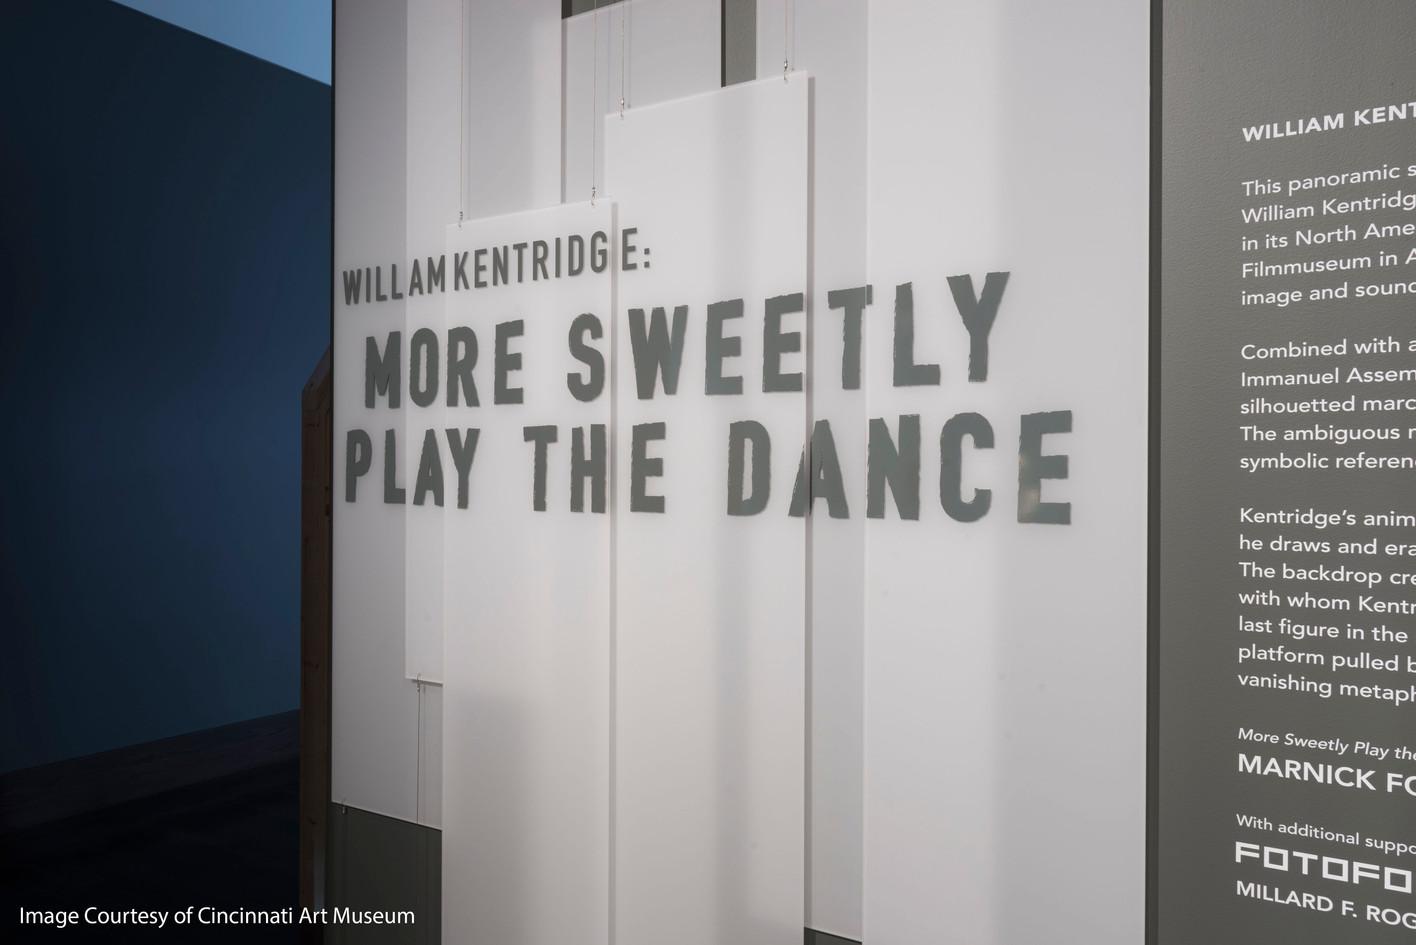 2017Kentridge_More_Sweetly_Dance_a03.jpg